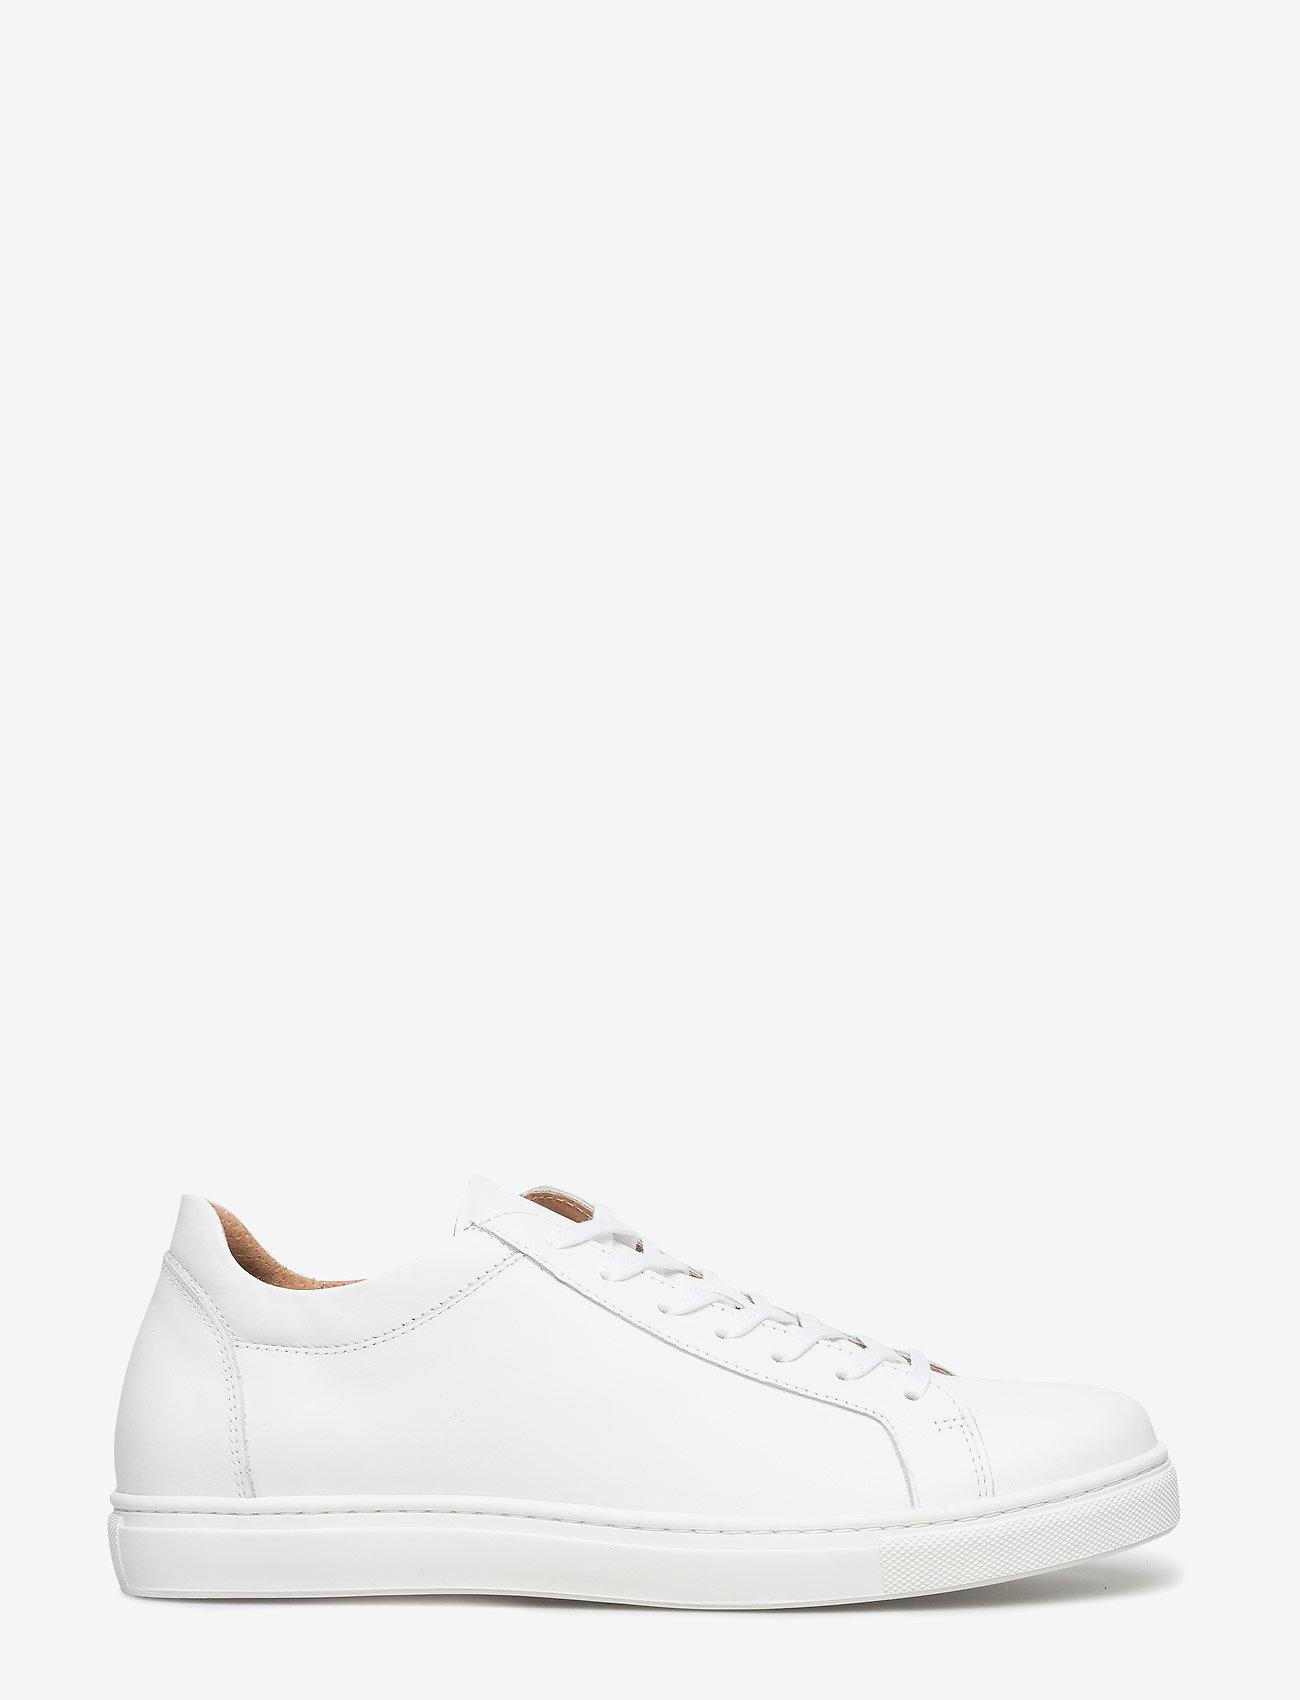 Selected Homme - SLHDAVID SNEAKER W NOOS - laag sneakers - white - 1